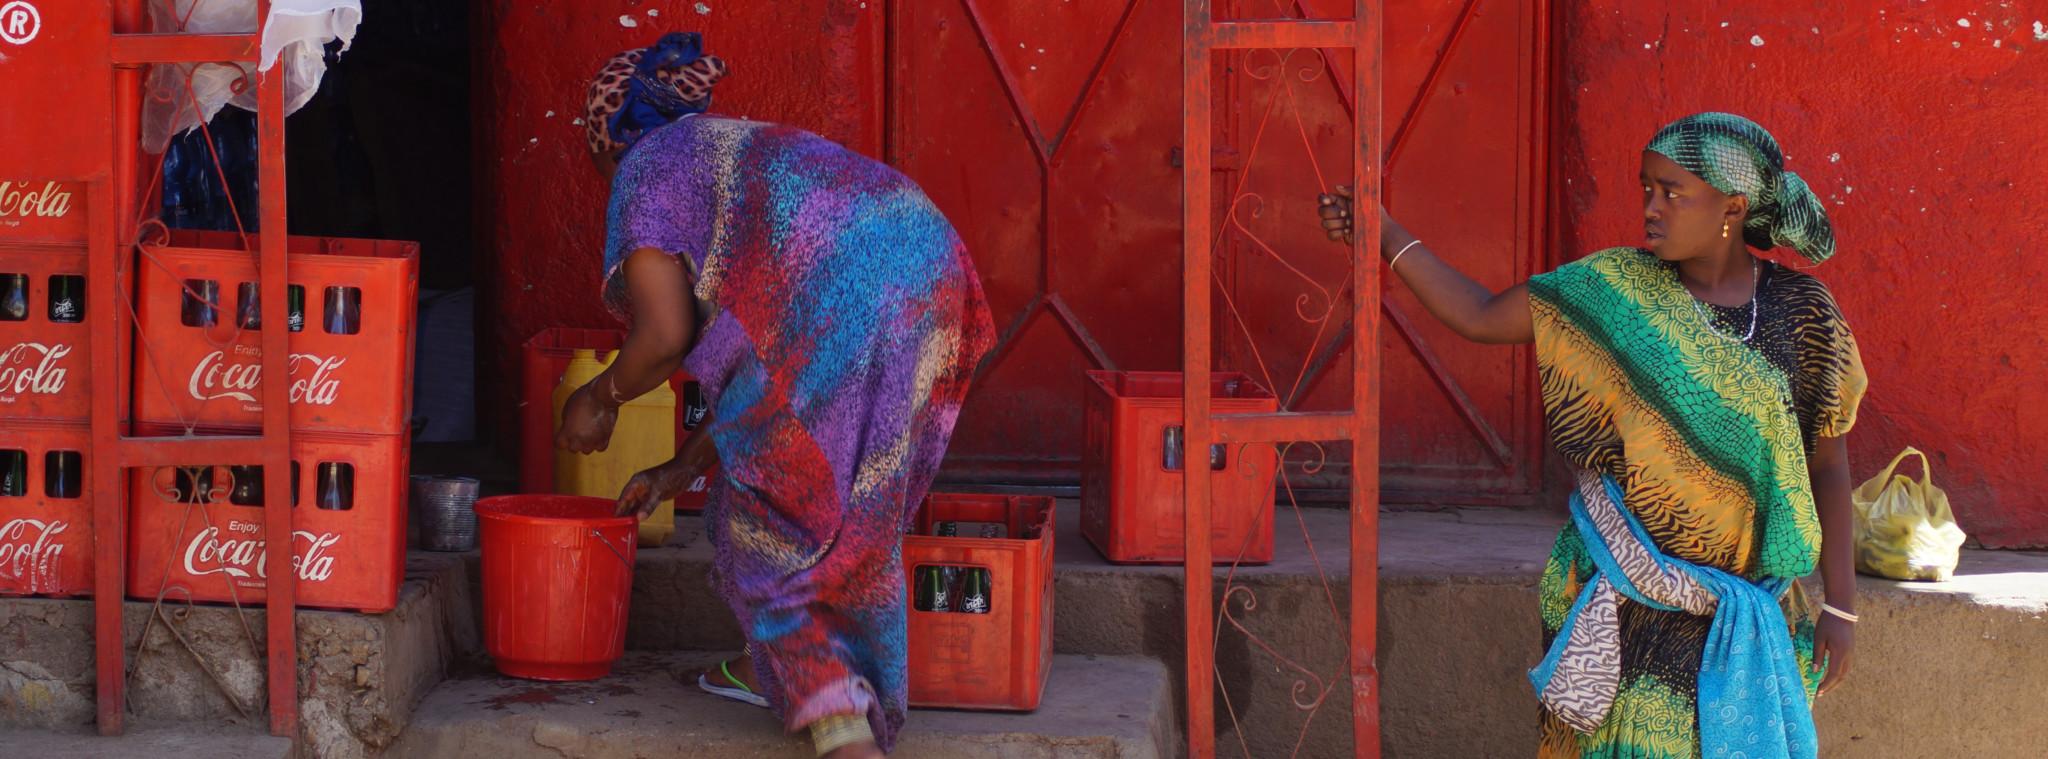 Marktverkäuferinnen in Harar